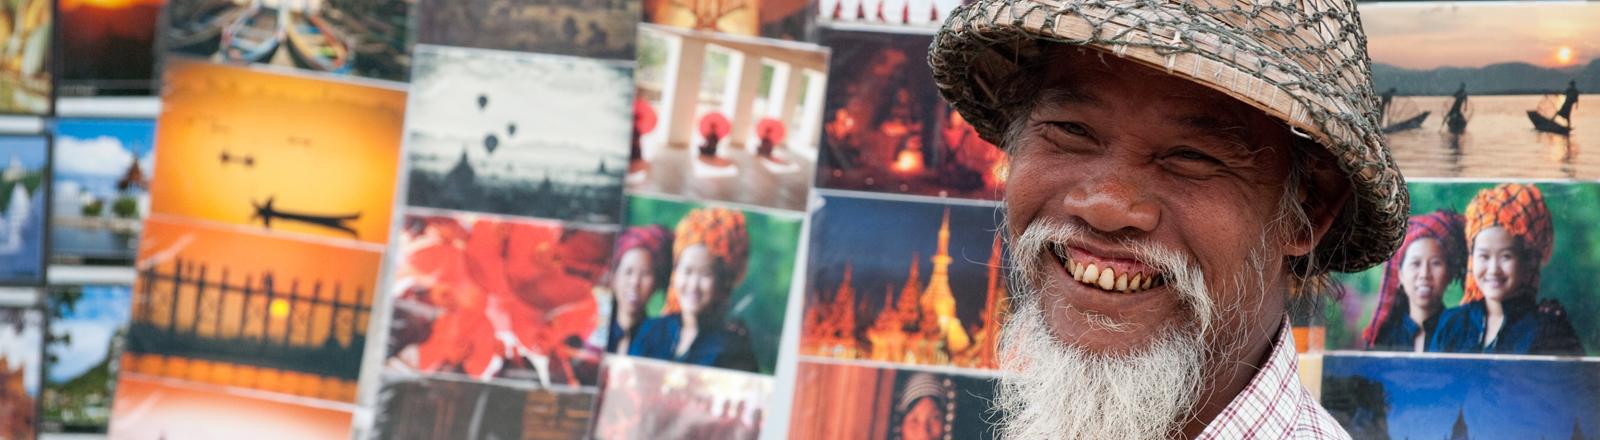 Ein Postkartenverkäufer in Myanmar